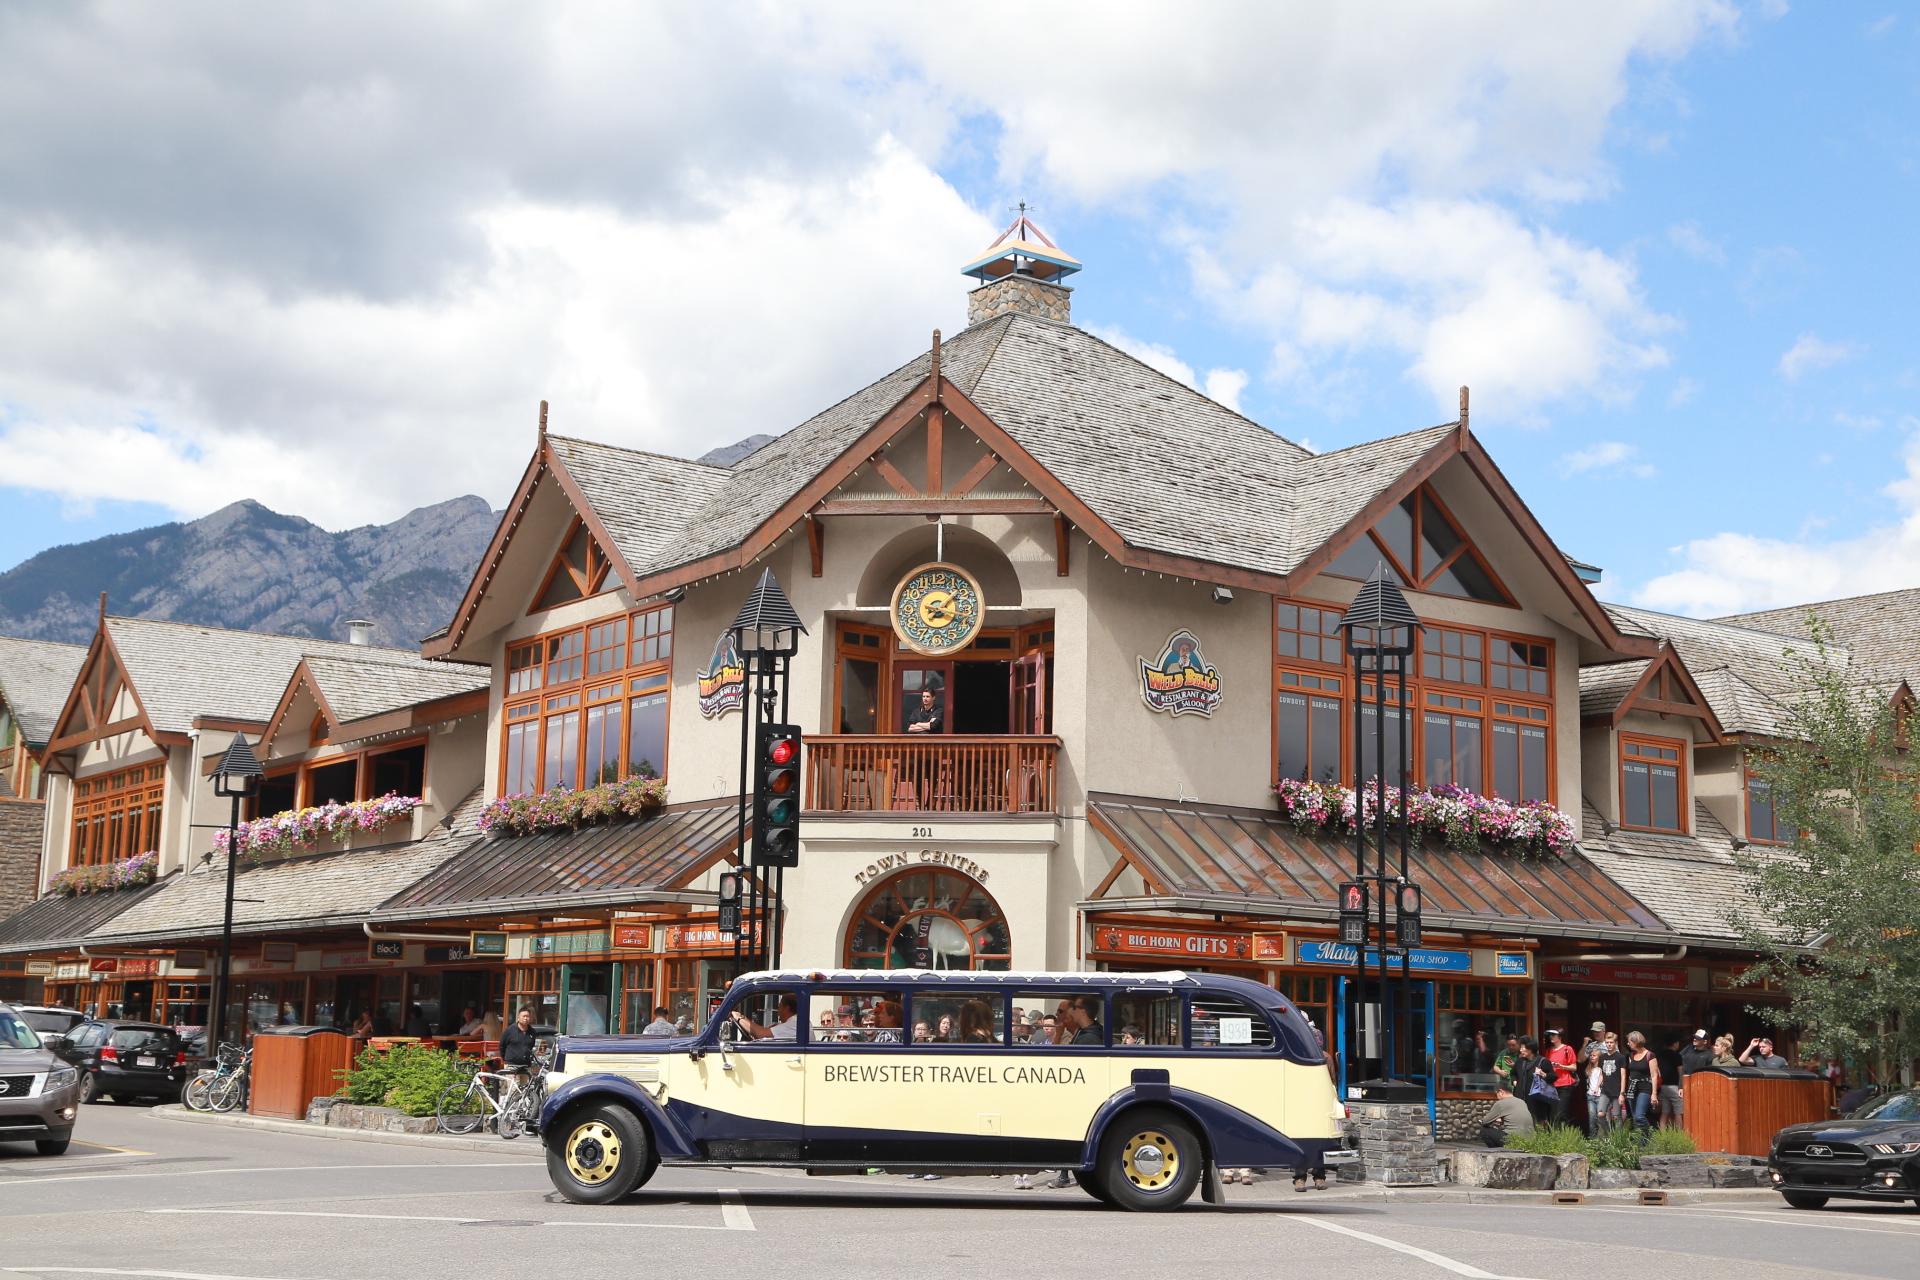 Erie Nick: Downtown Banff